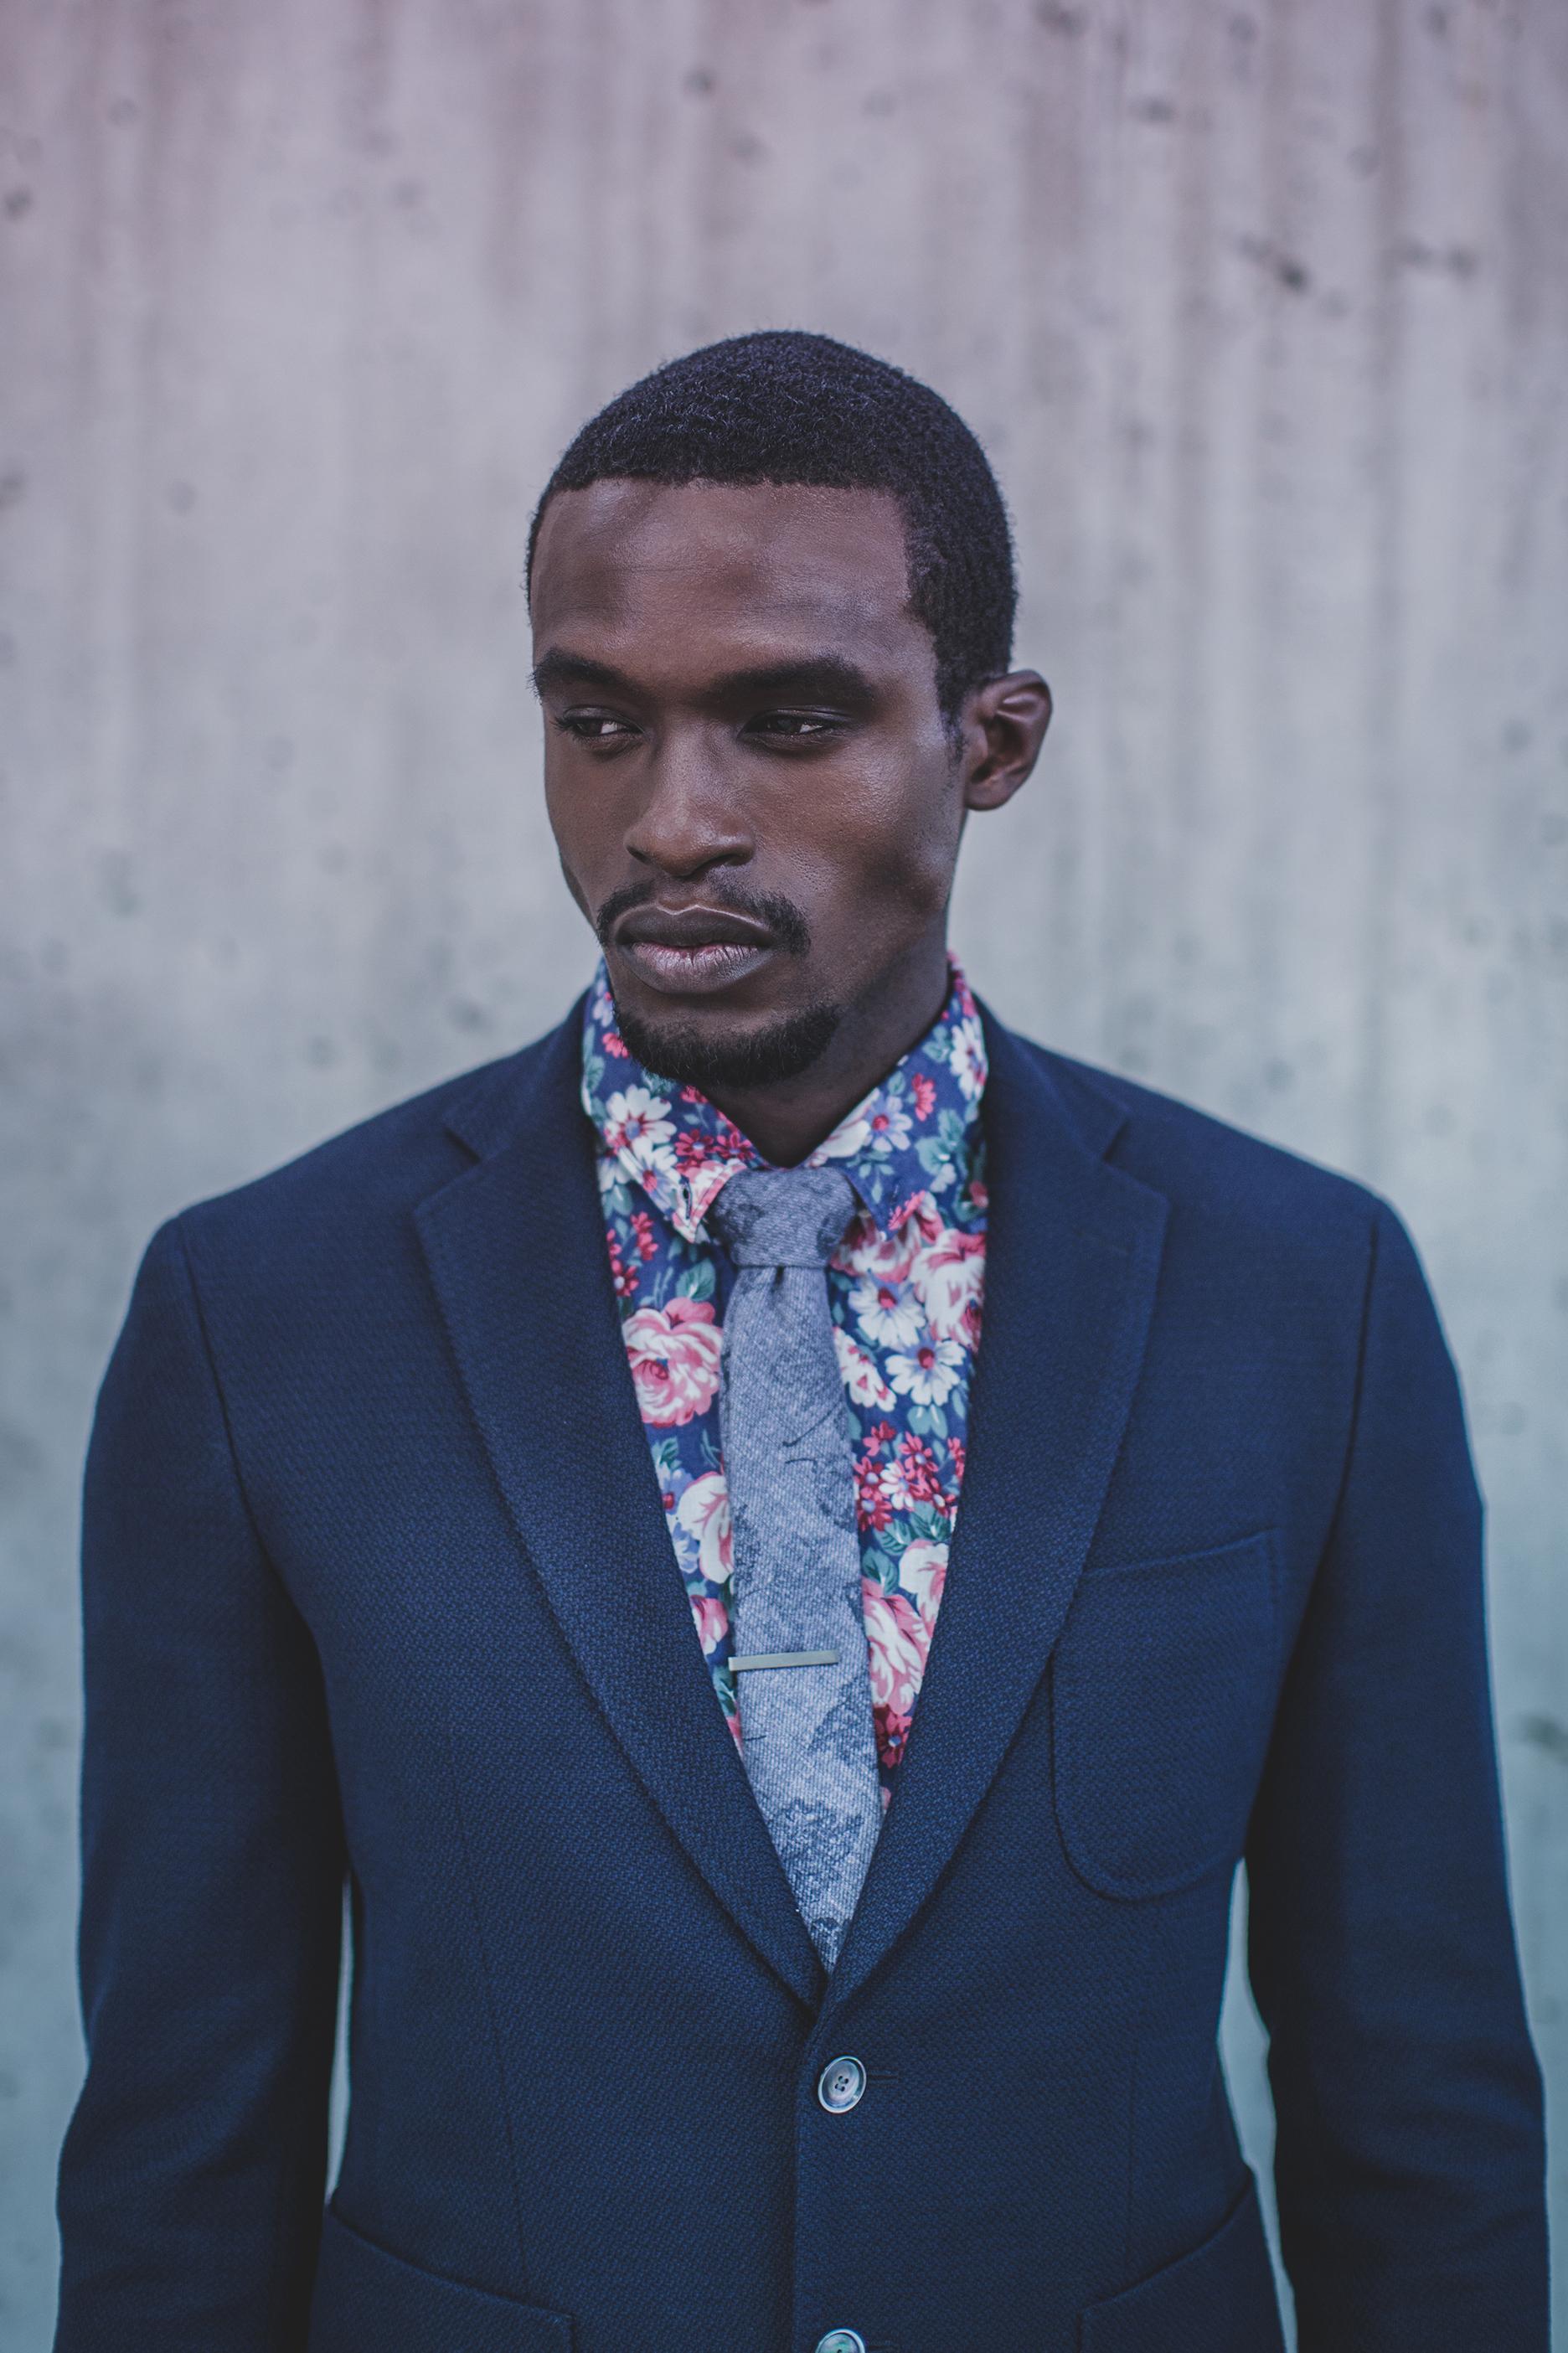 © duston-todd-floral-menswear-suit-fashion-urban.jpg.jpg